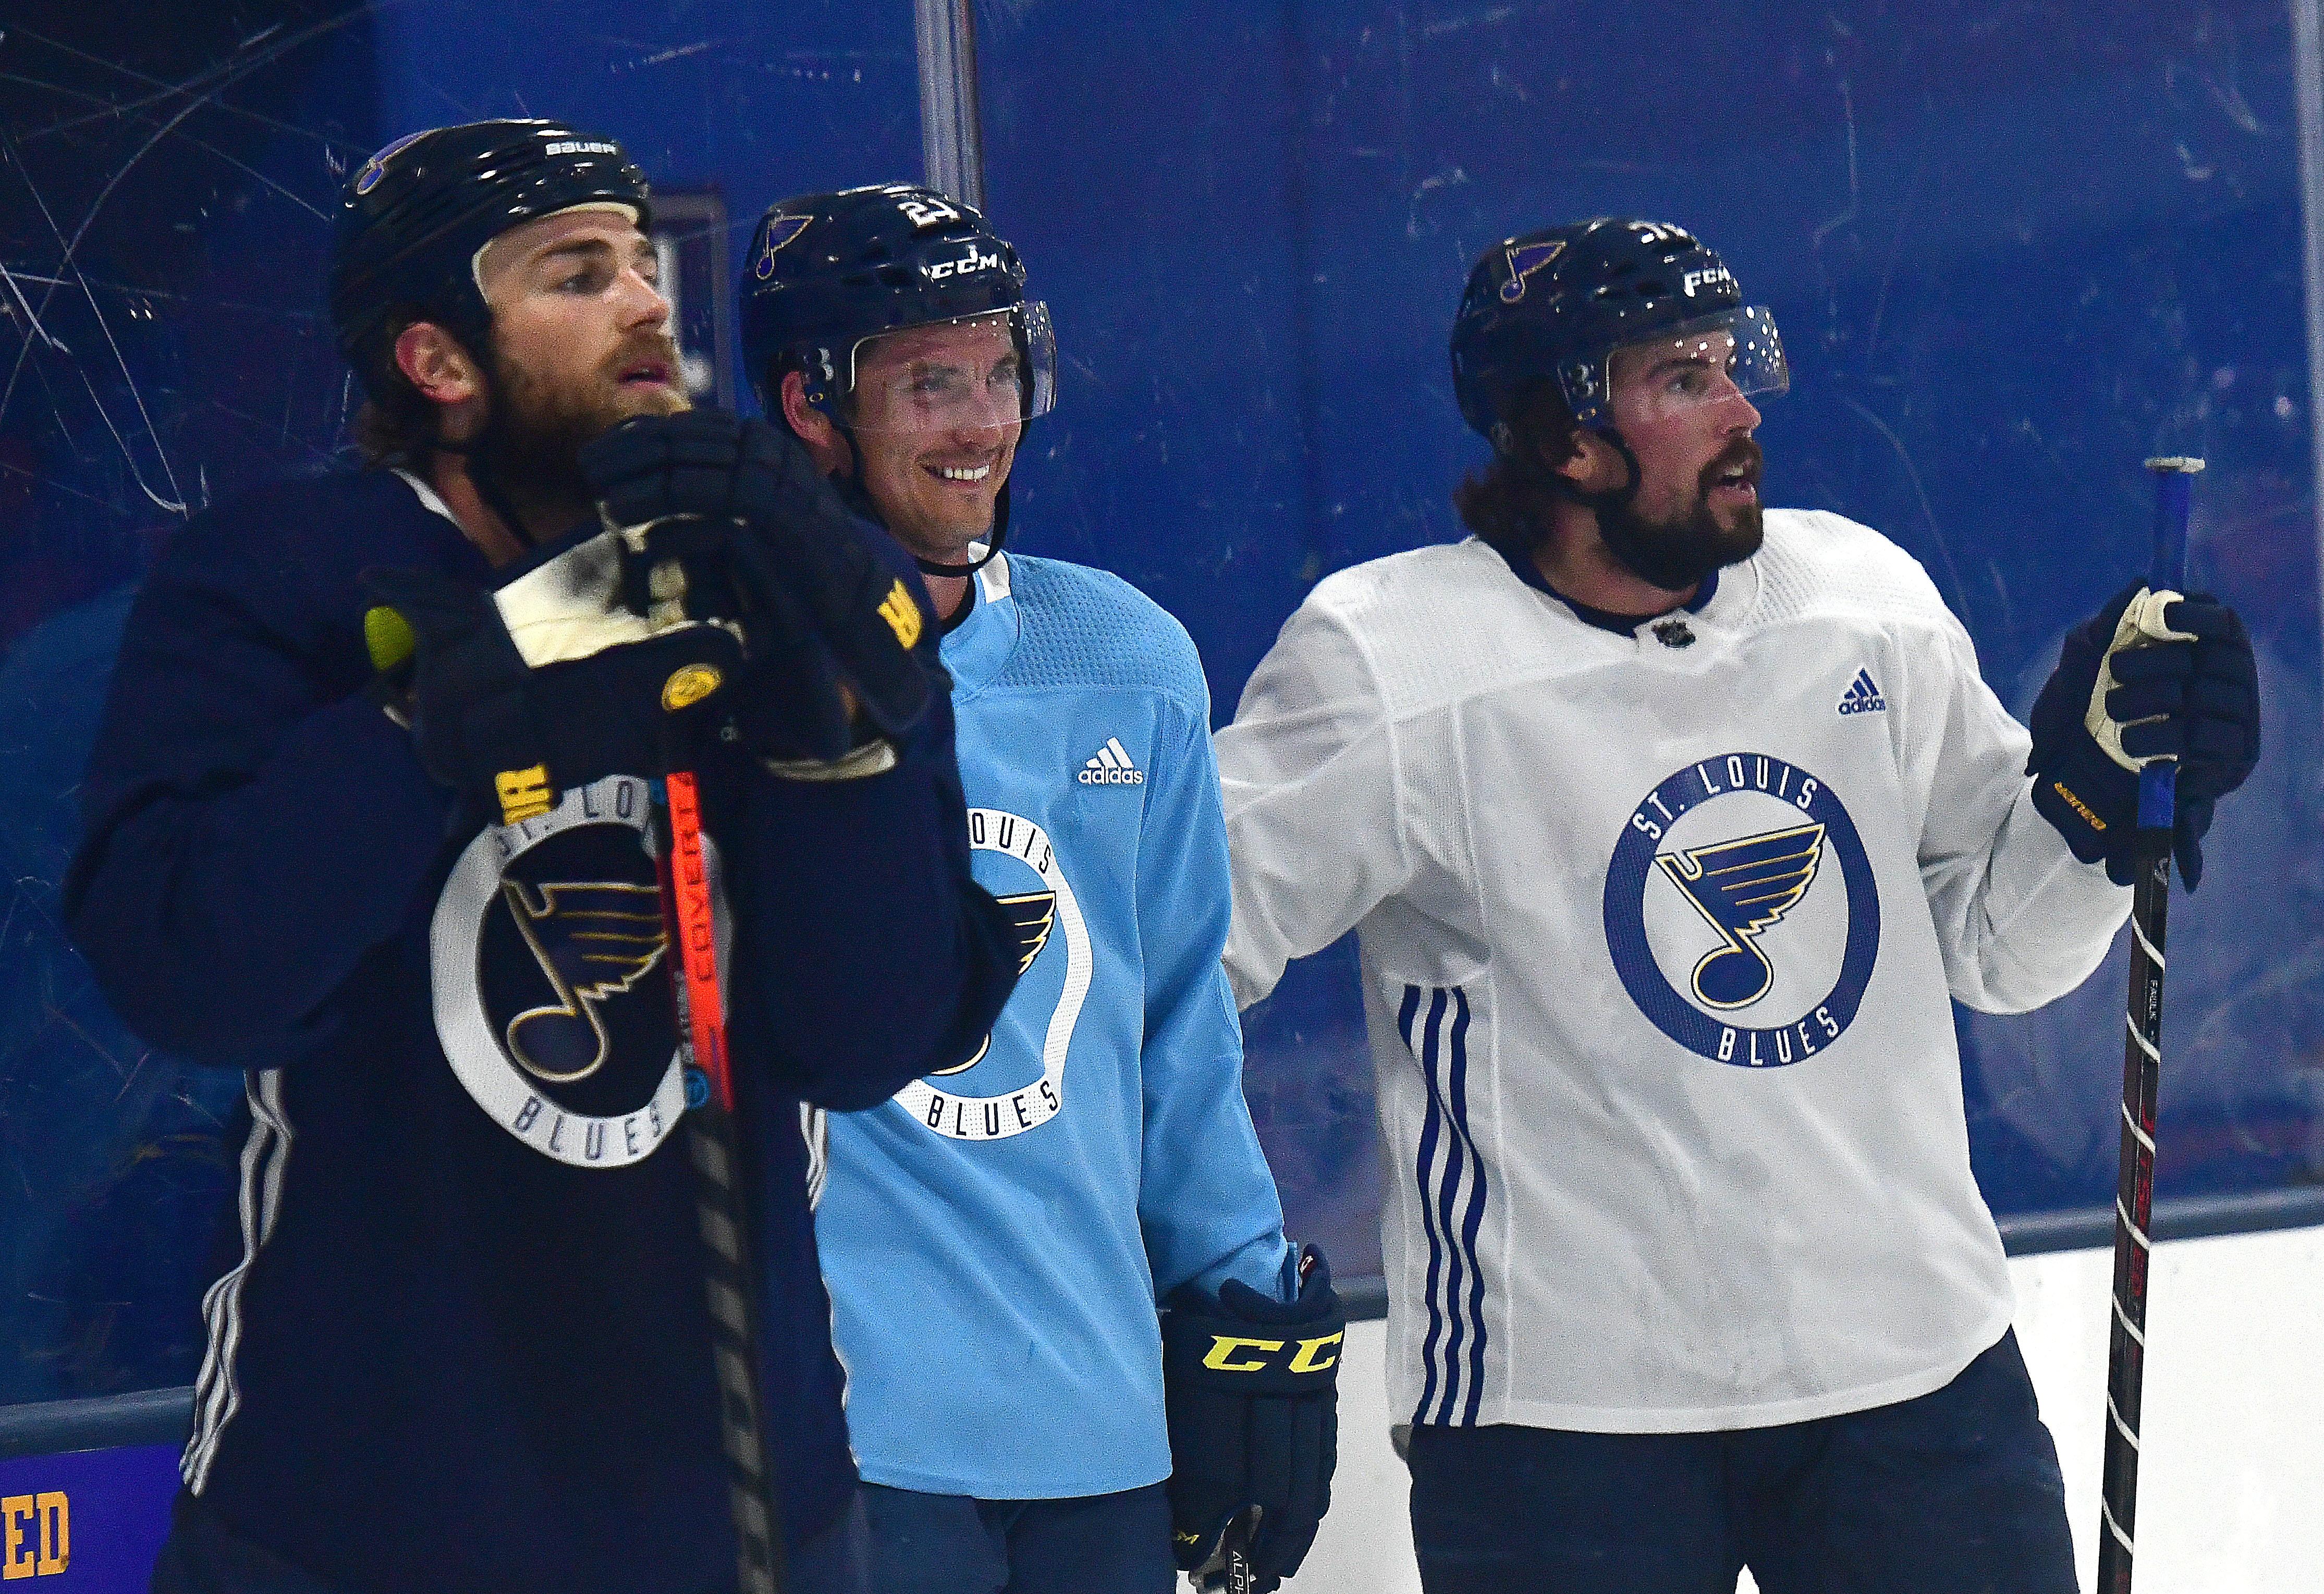 NHL: JUL 17 St. Louis Blues Training Camp